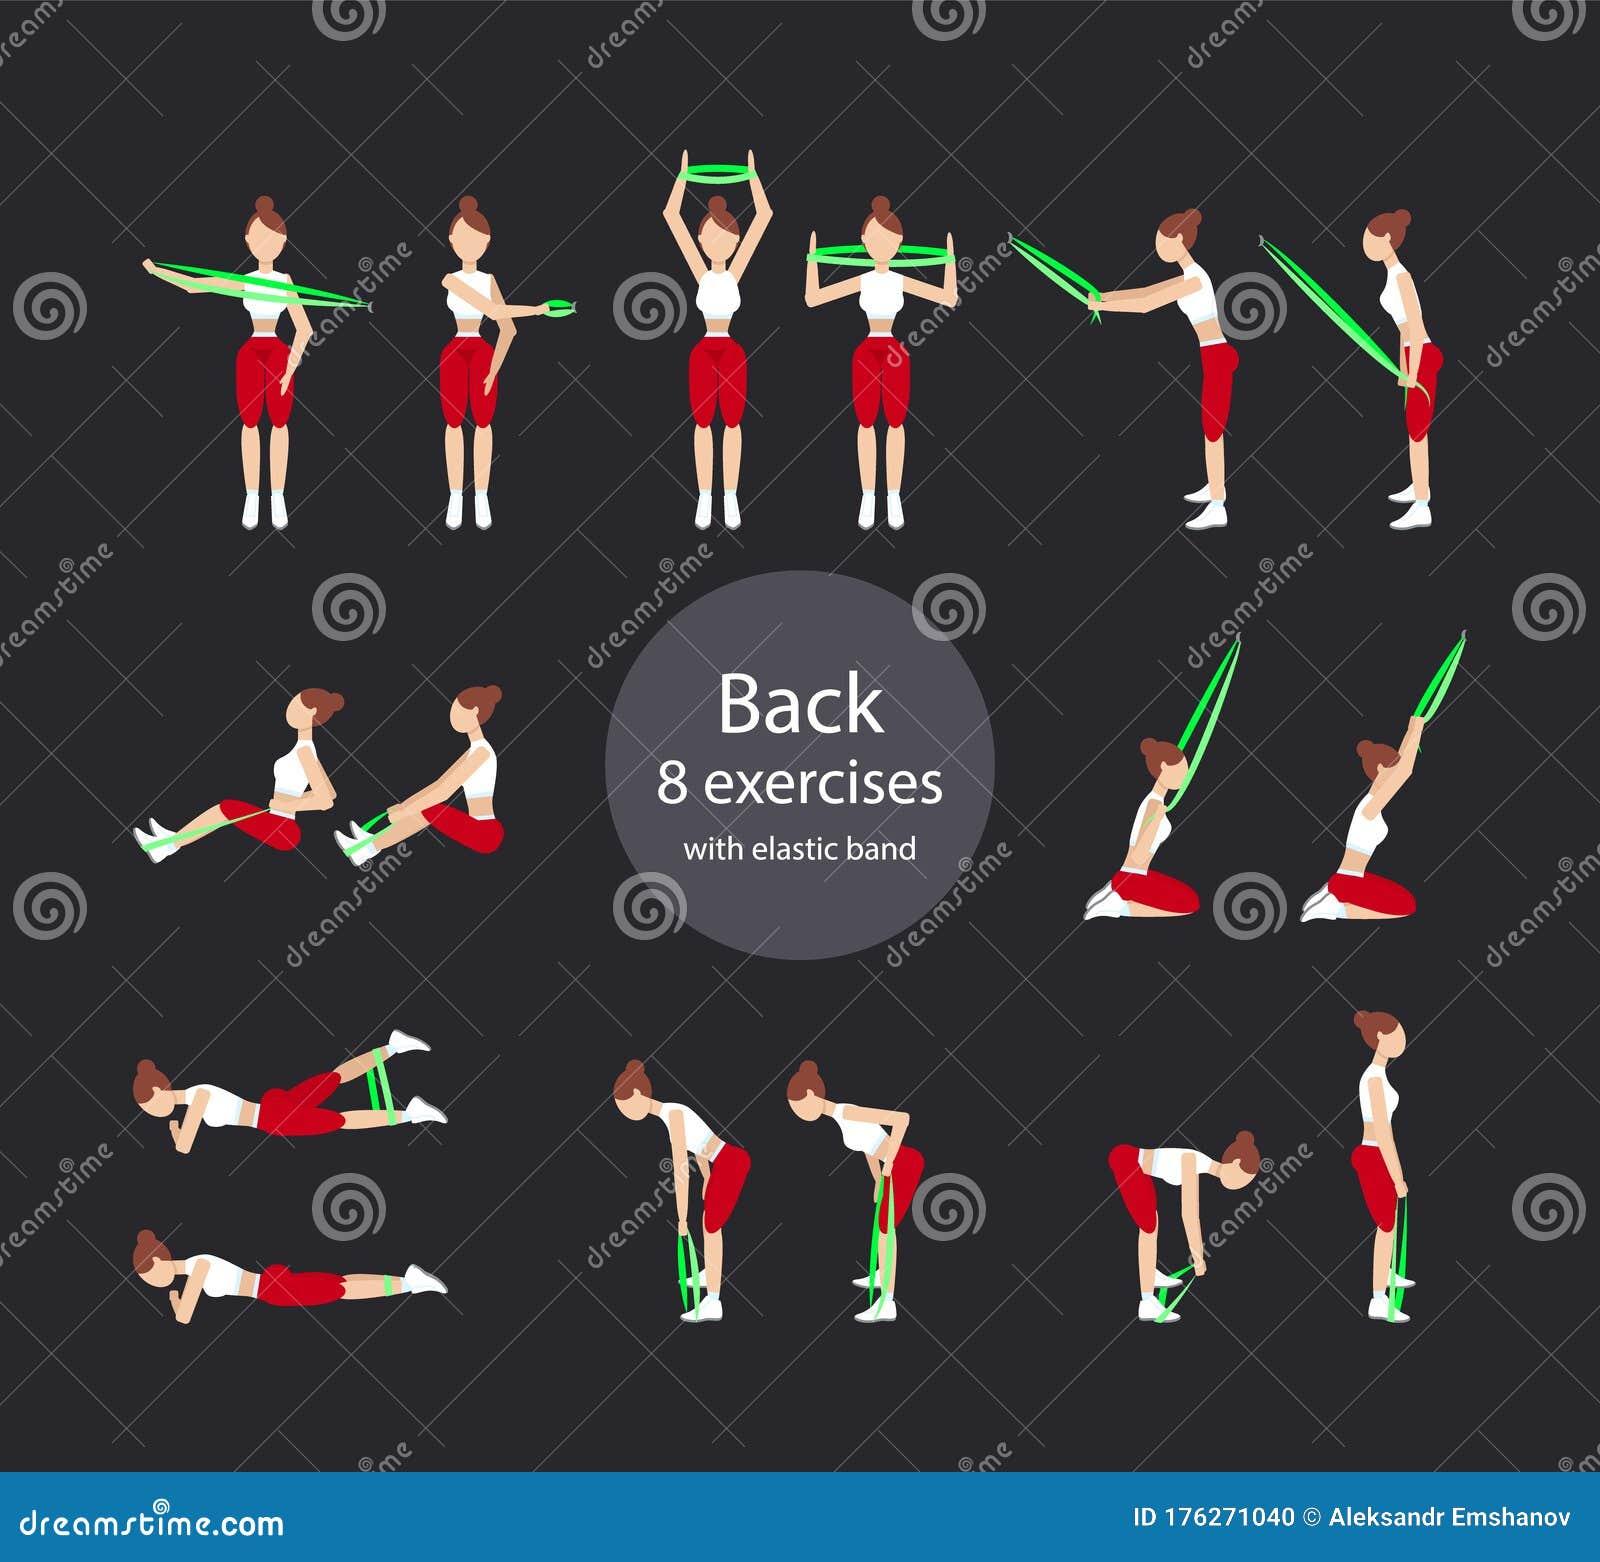 Back 8 Exercises With Elastic Band Stock Illustration